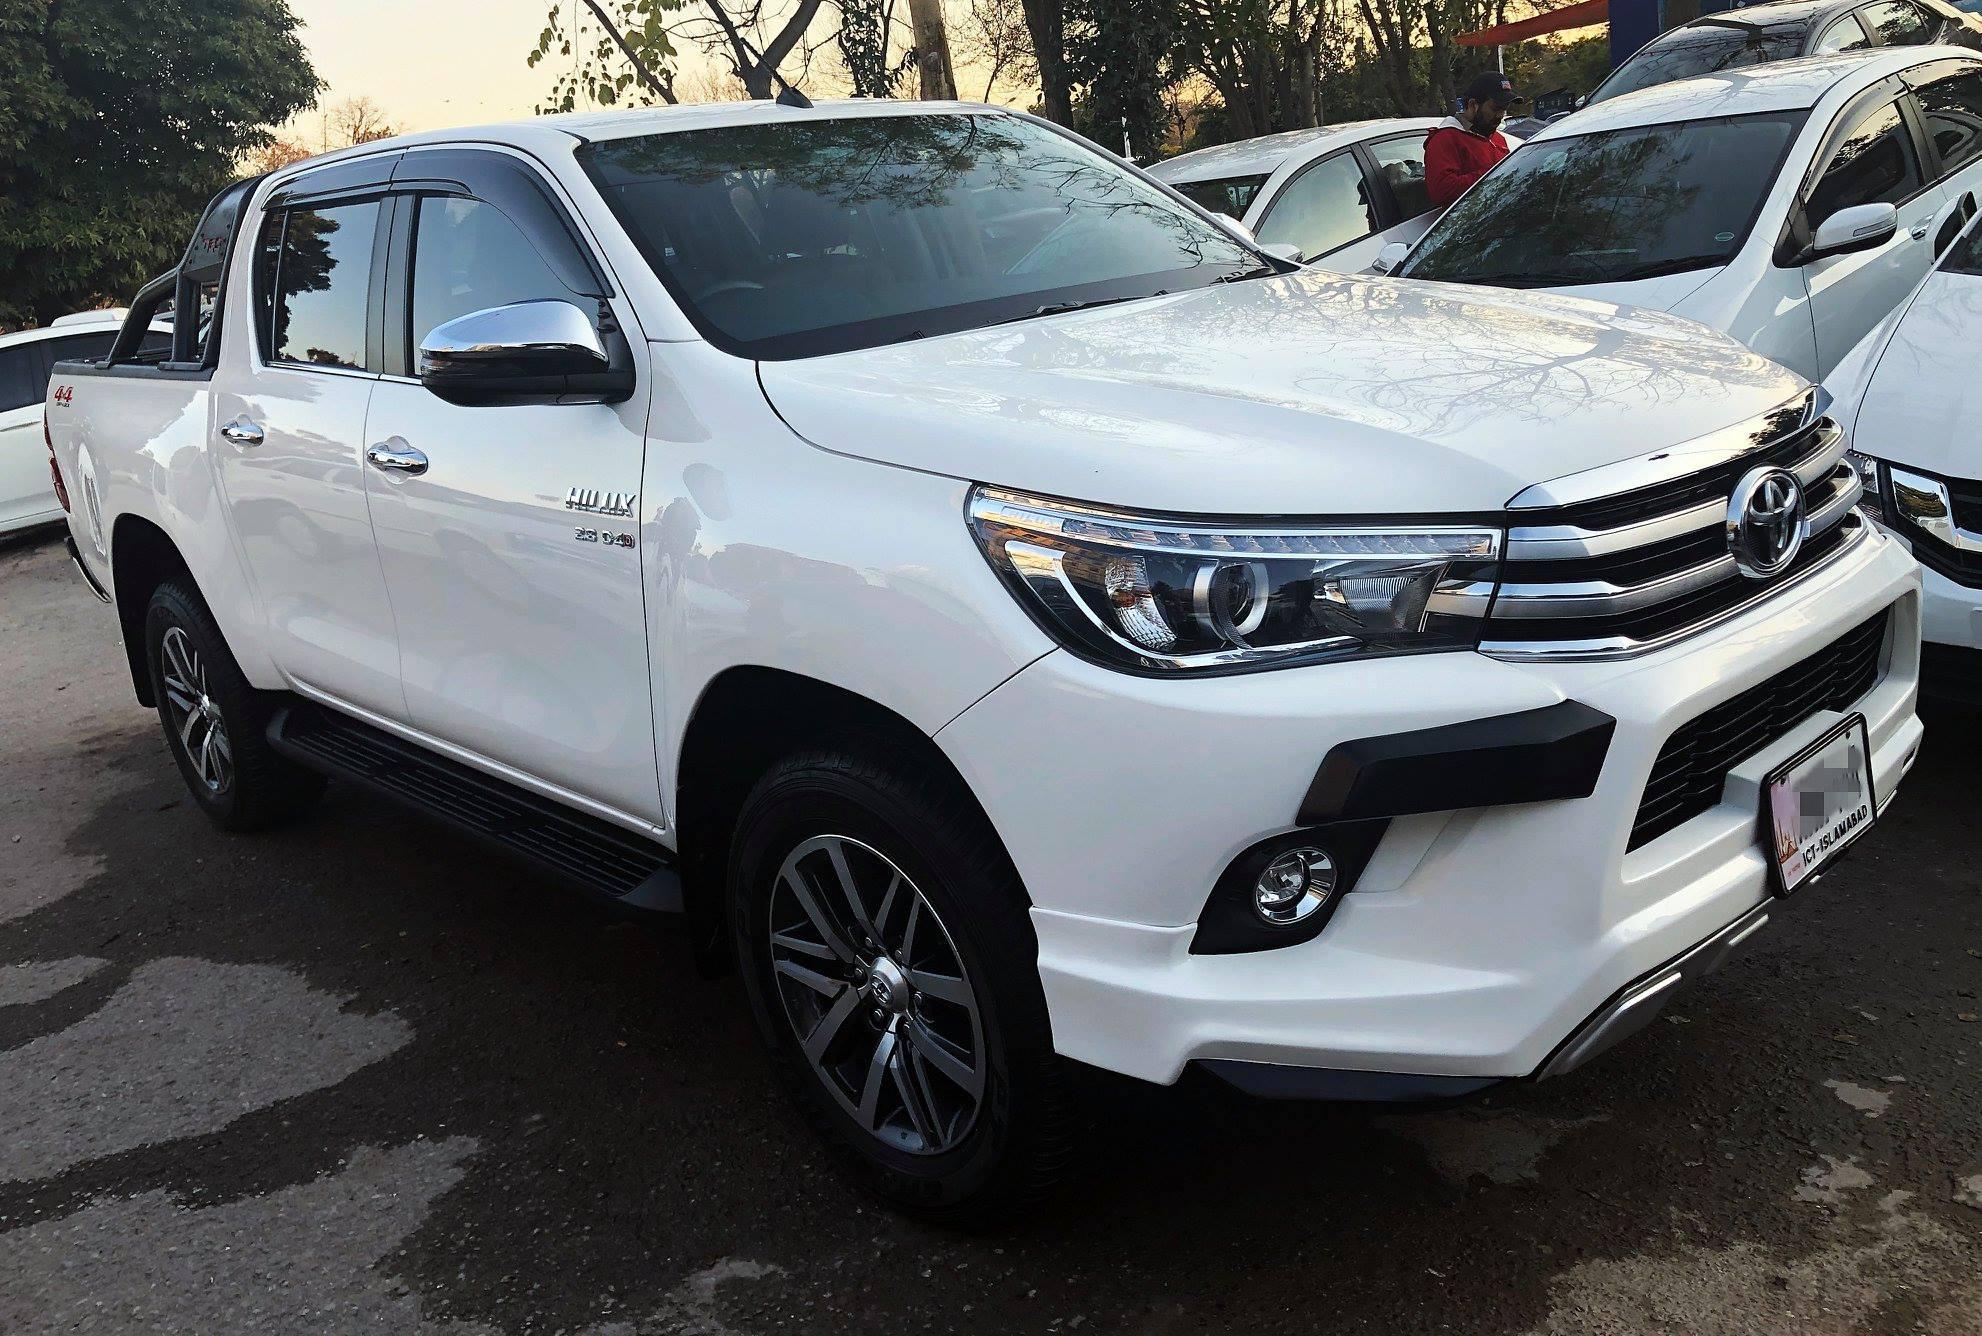 Toyota Hilux and Isuzu D-Max Sales Comparison 2